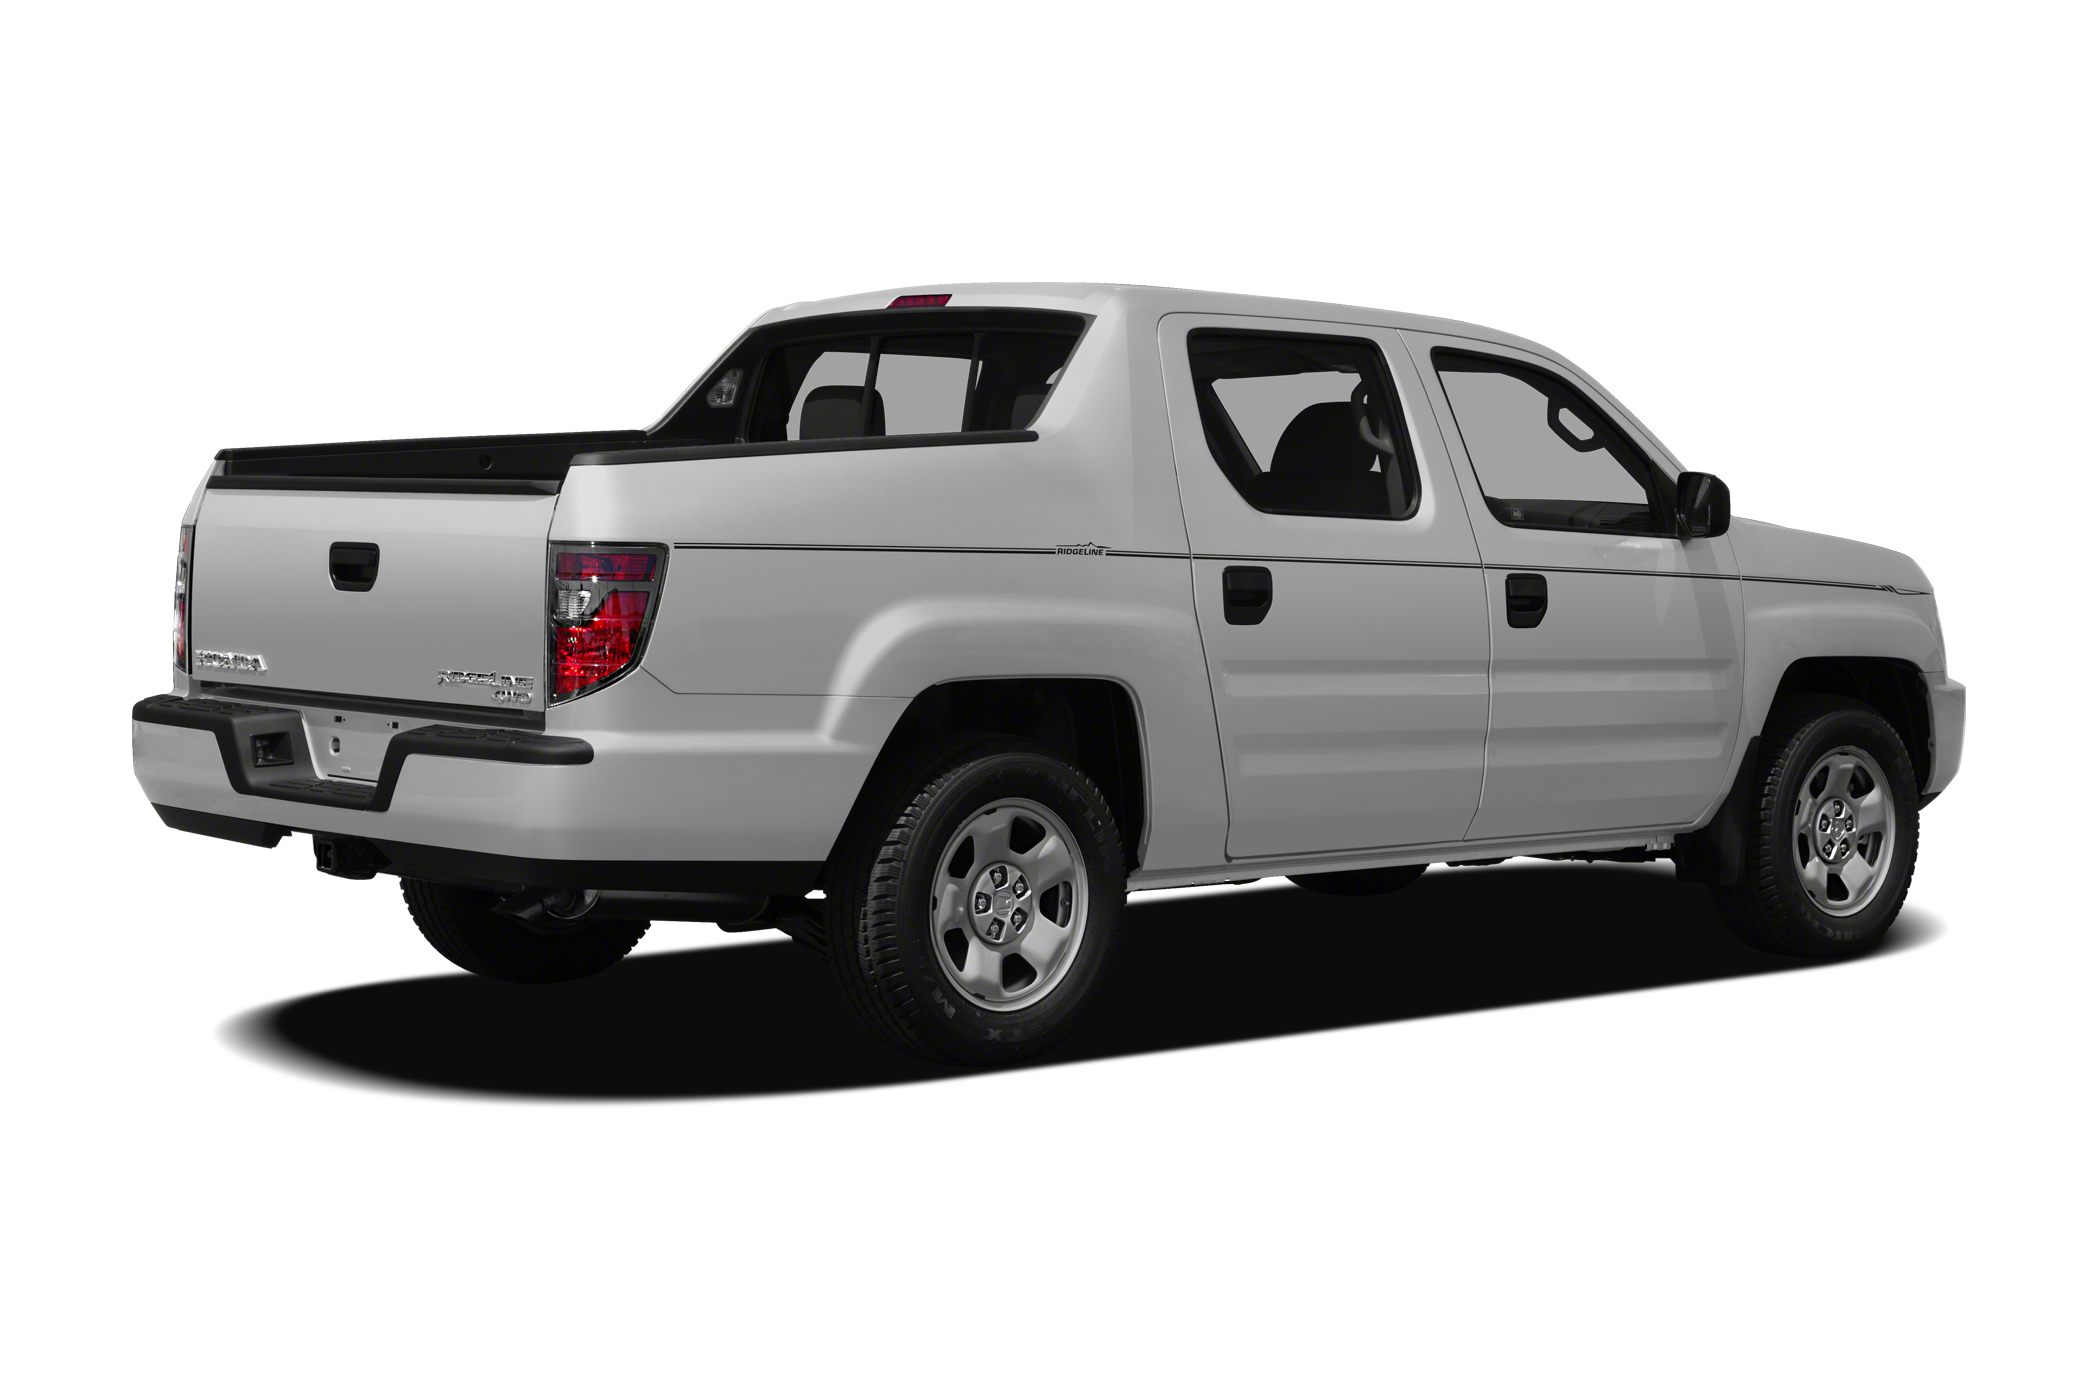 2012 Honda Ridgeline RT Clean CARFAX Black 2012 Honda Ridgeline RT 4WD 35L V6 SOHC VTEC 24V Rece